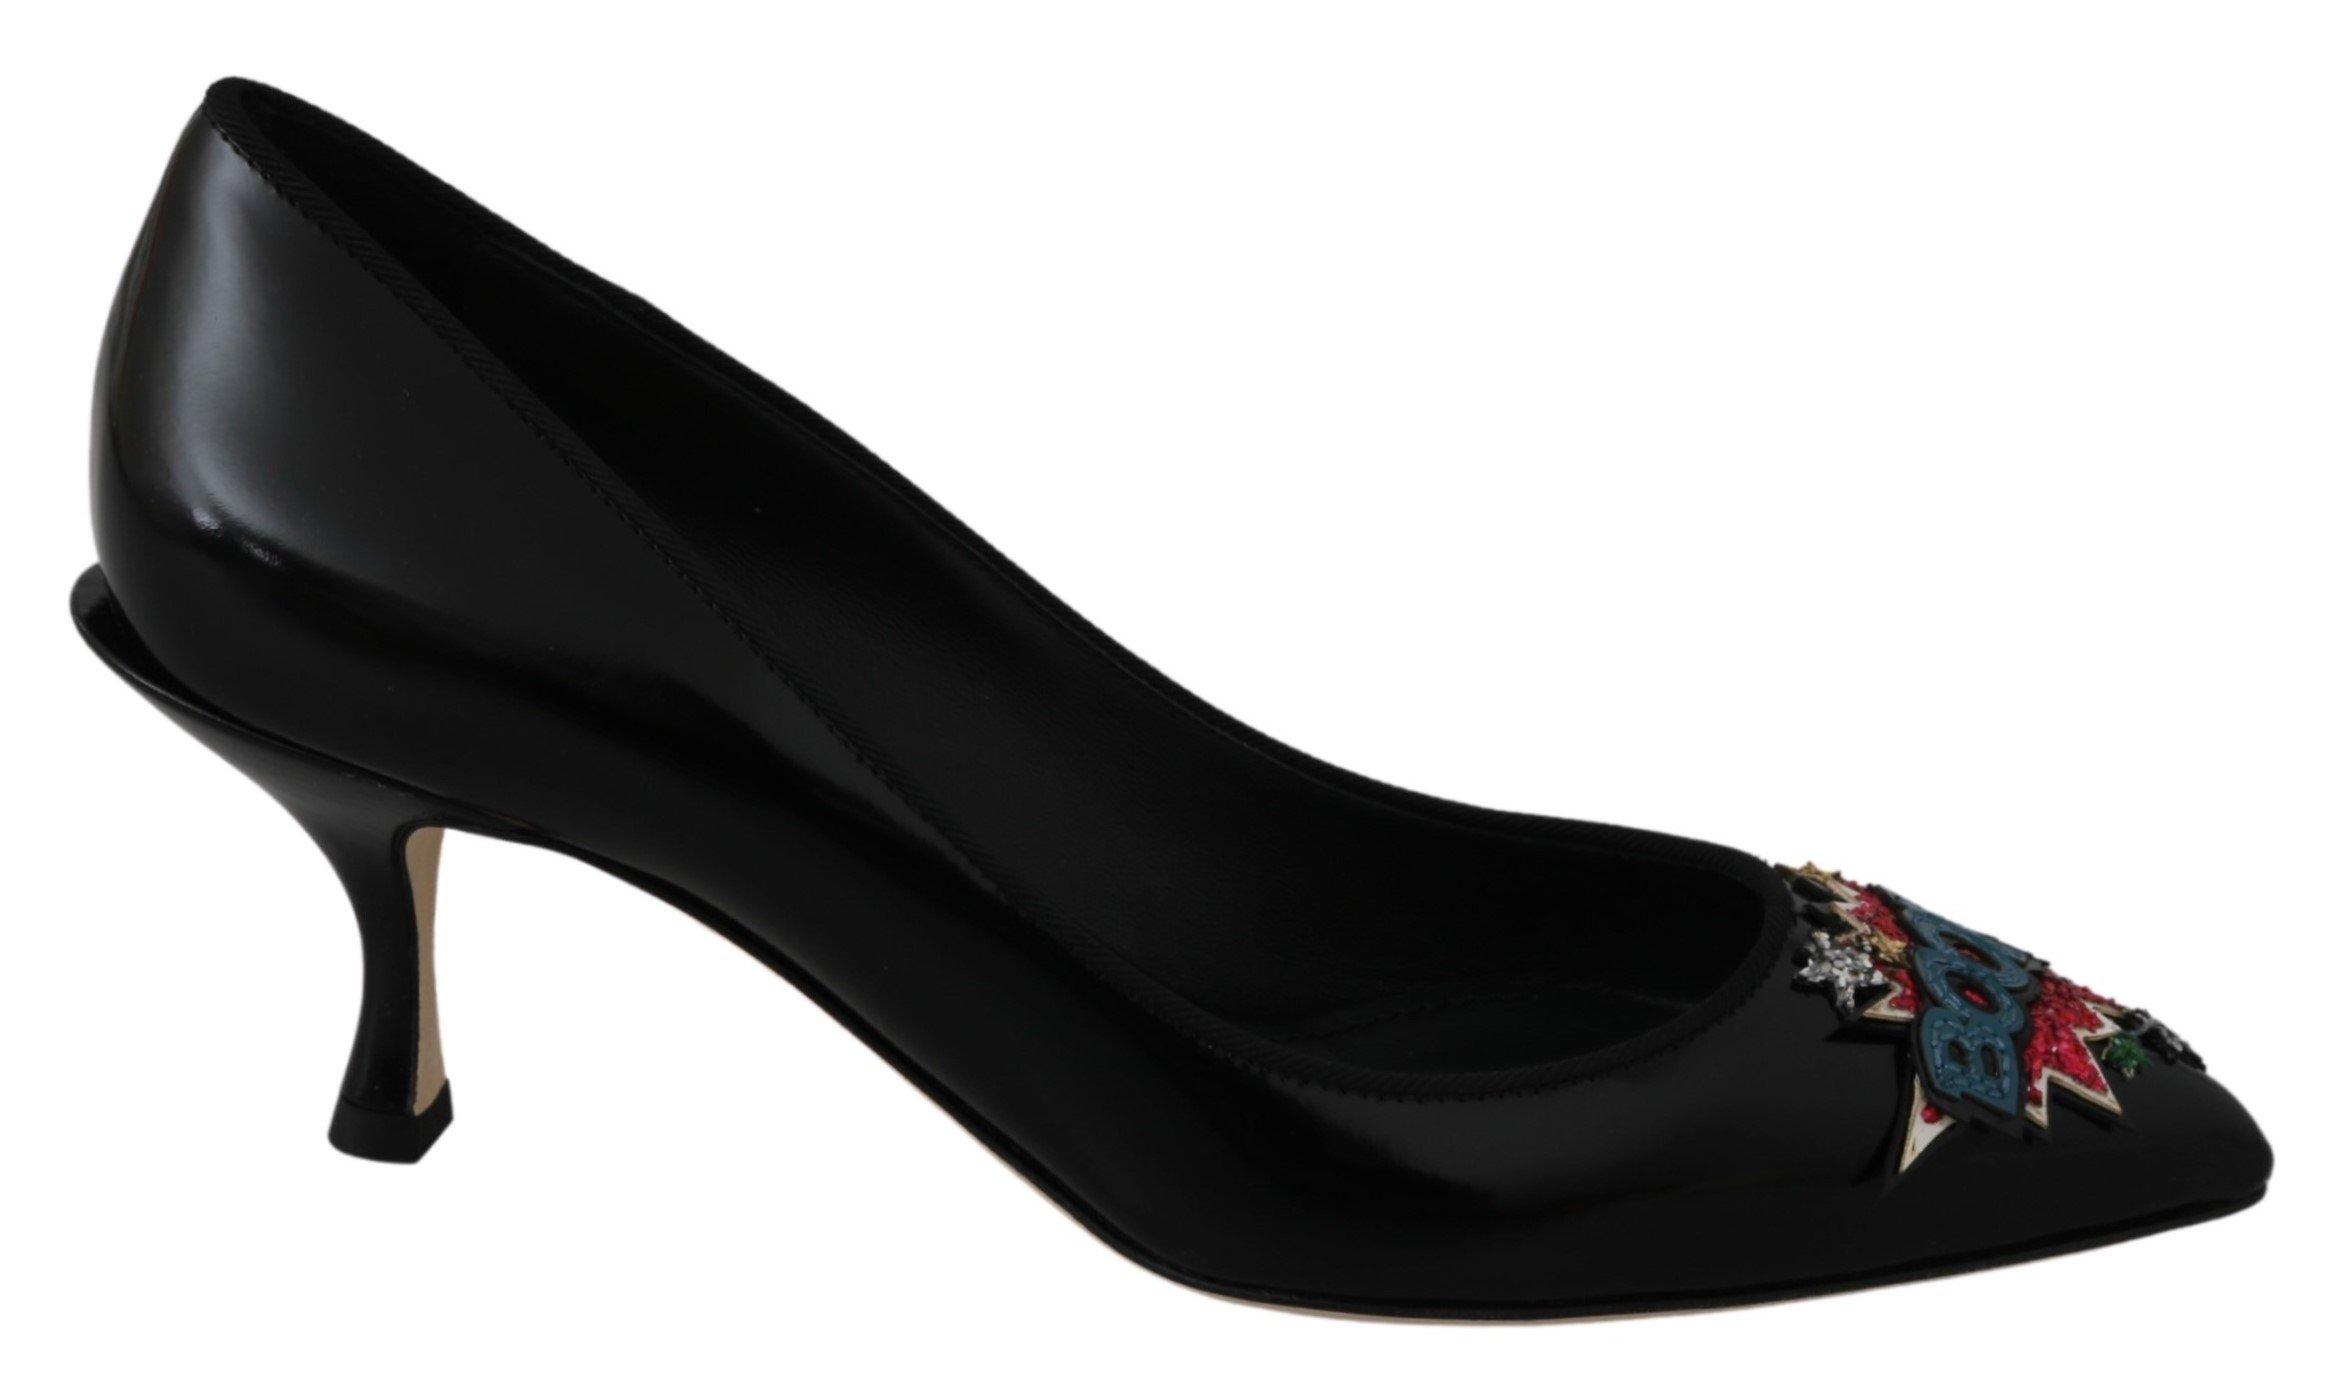 Black Leather BOOM Heels Pumps Shoes - EU35/US4.5